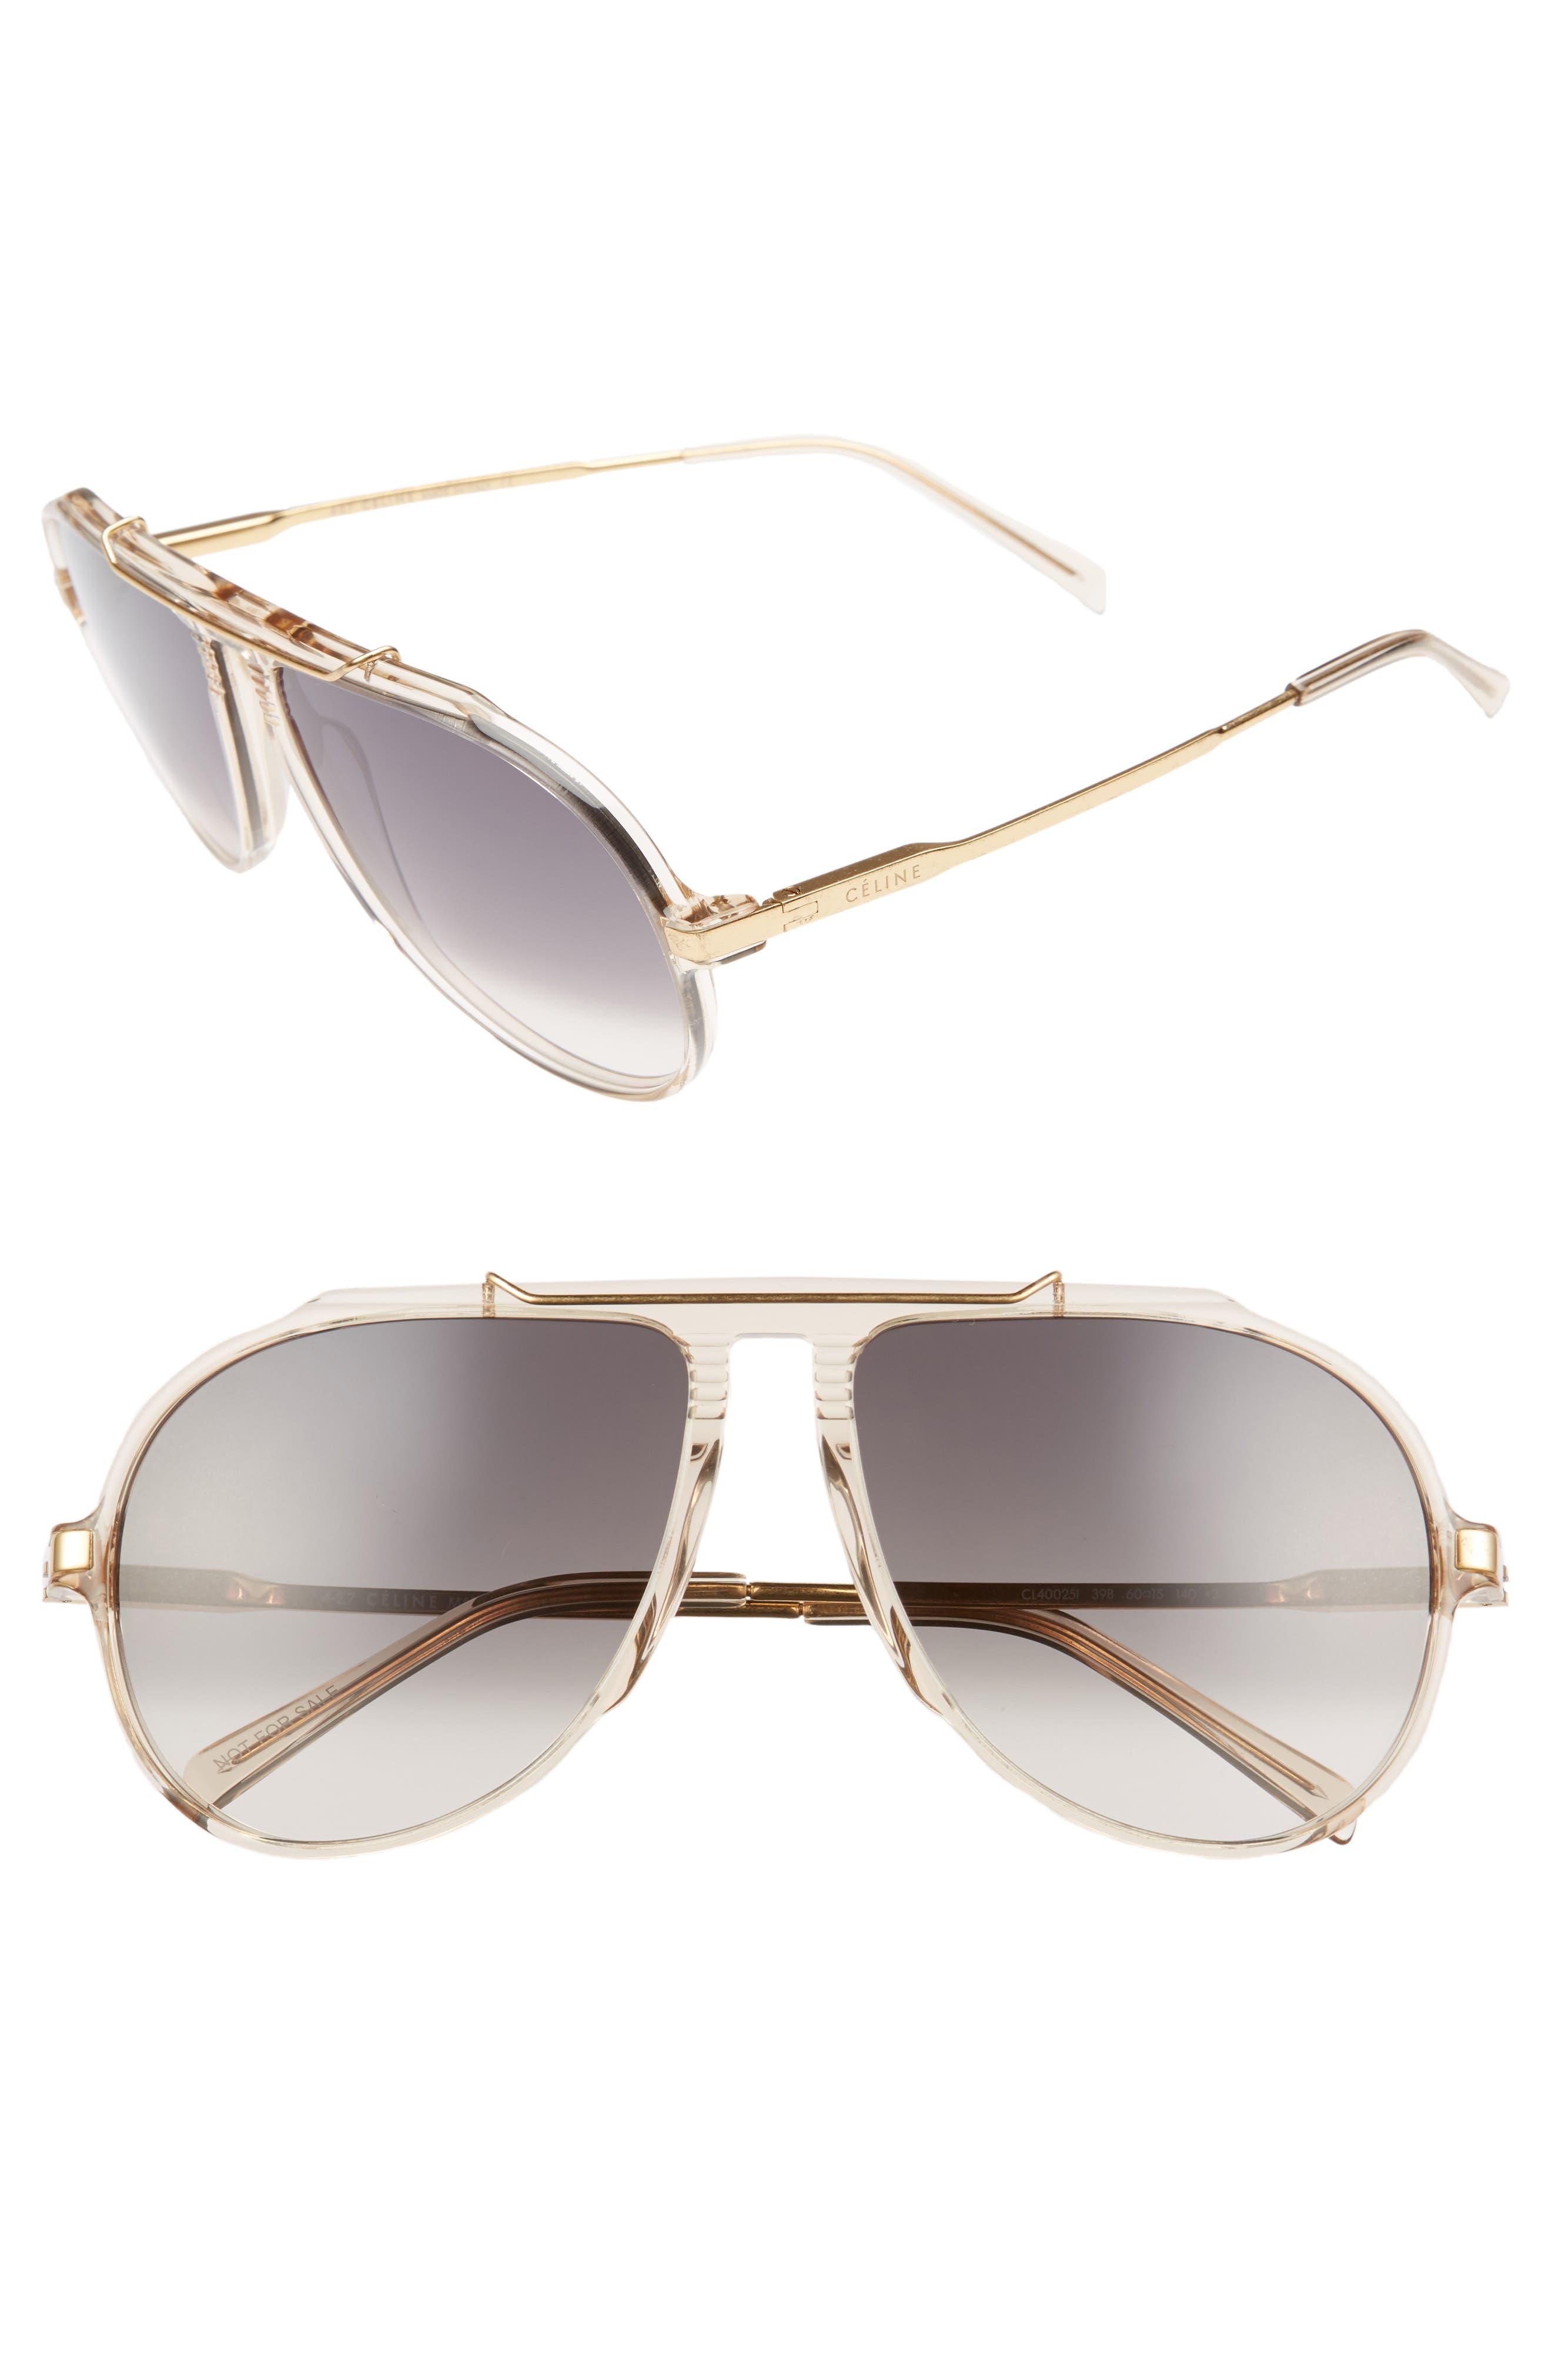 Alternate Image 1 Selected - Céline 60mm Gradient Aviator Sunglasses